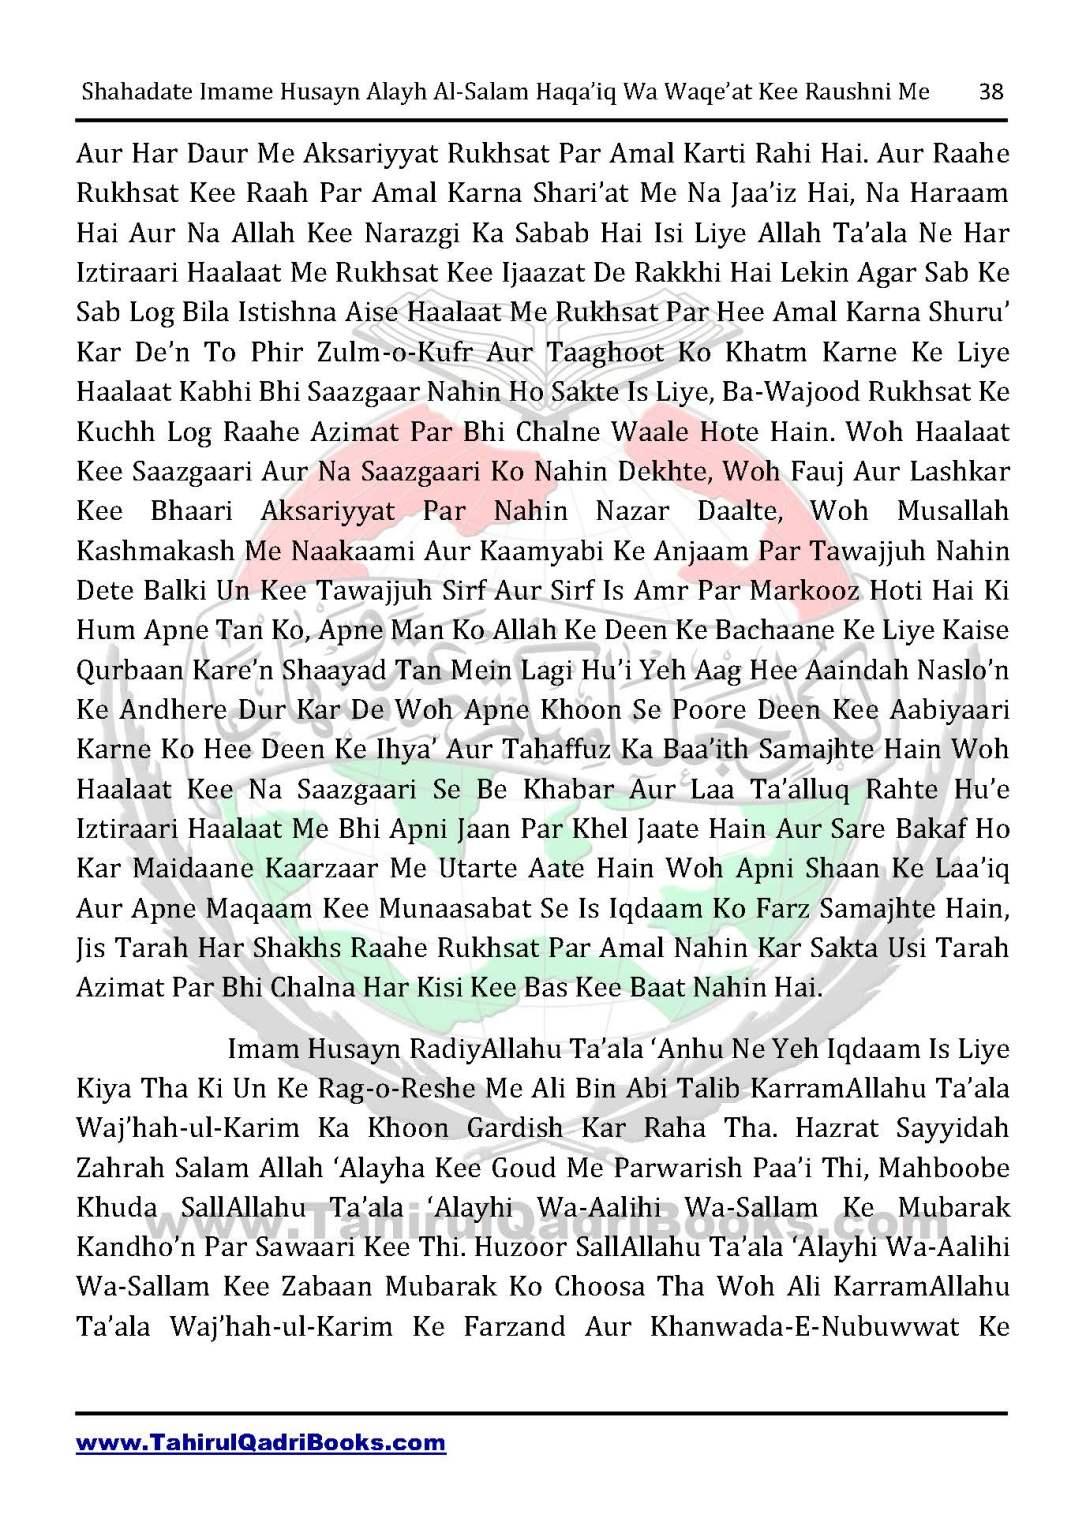 shahadate-imame-husayn-alayh-is-salam-haqaiq-wa-waqe_at-kee-raushni-me-in-roman-urdu-unlocked_Page_38